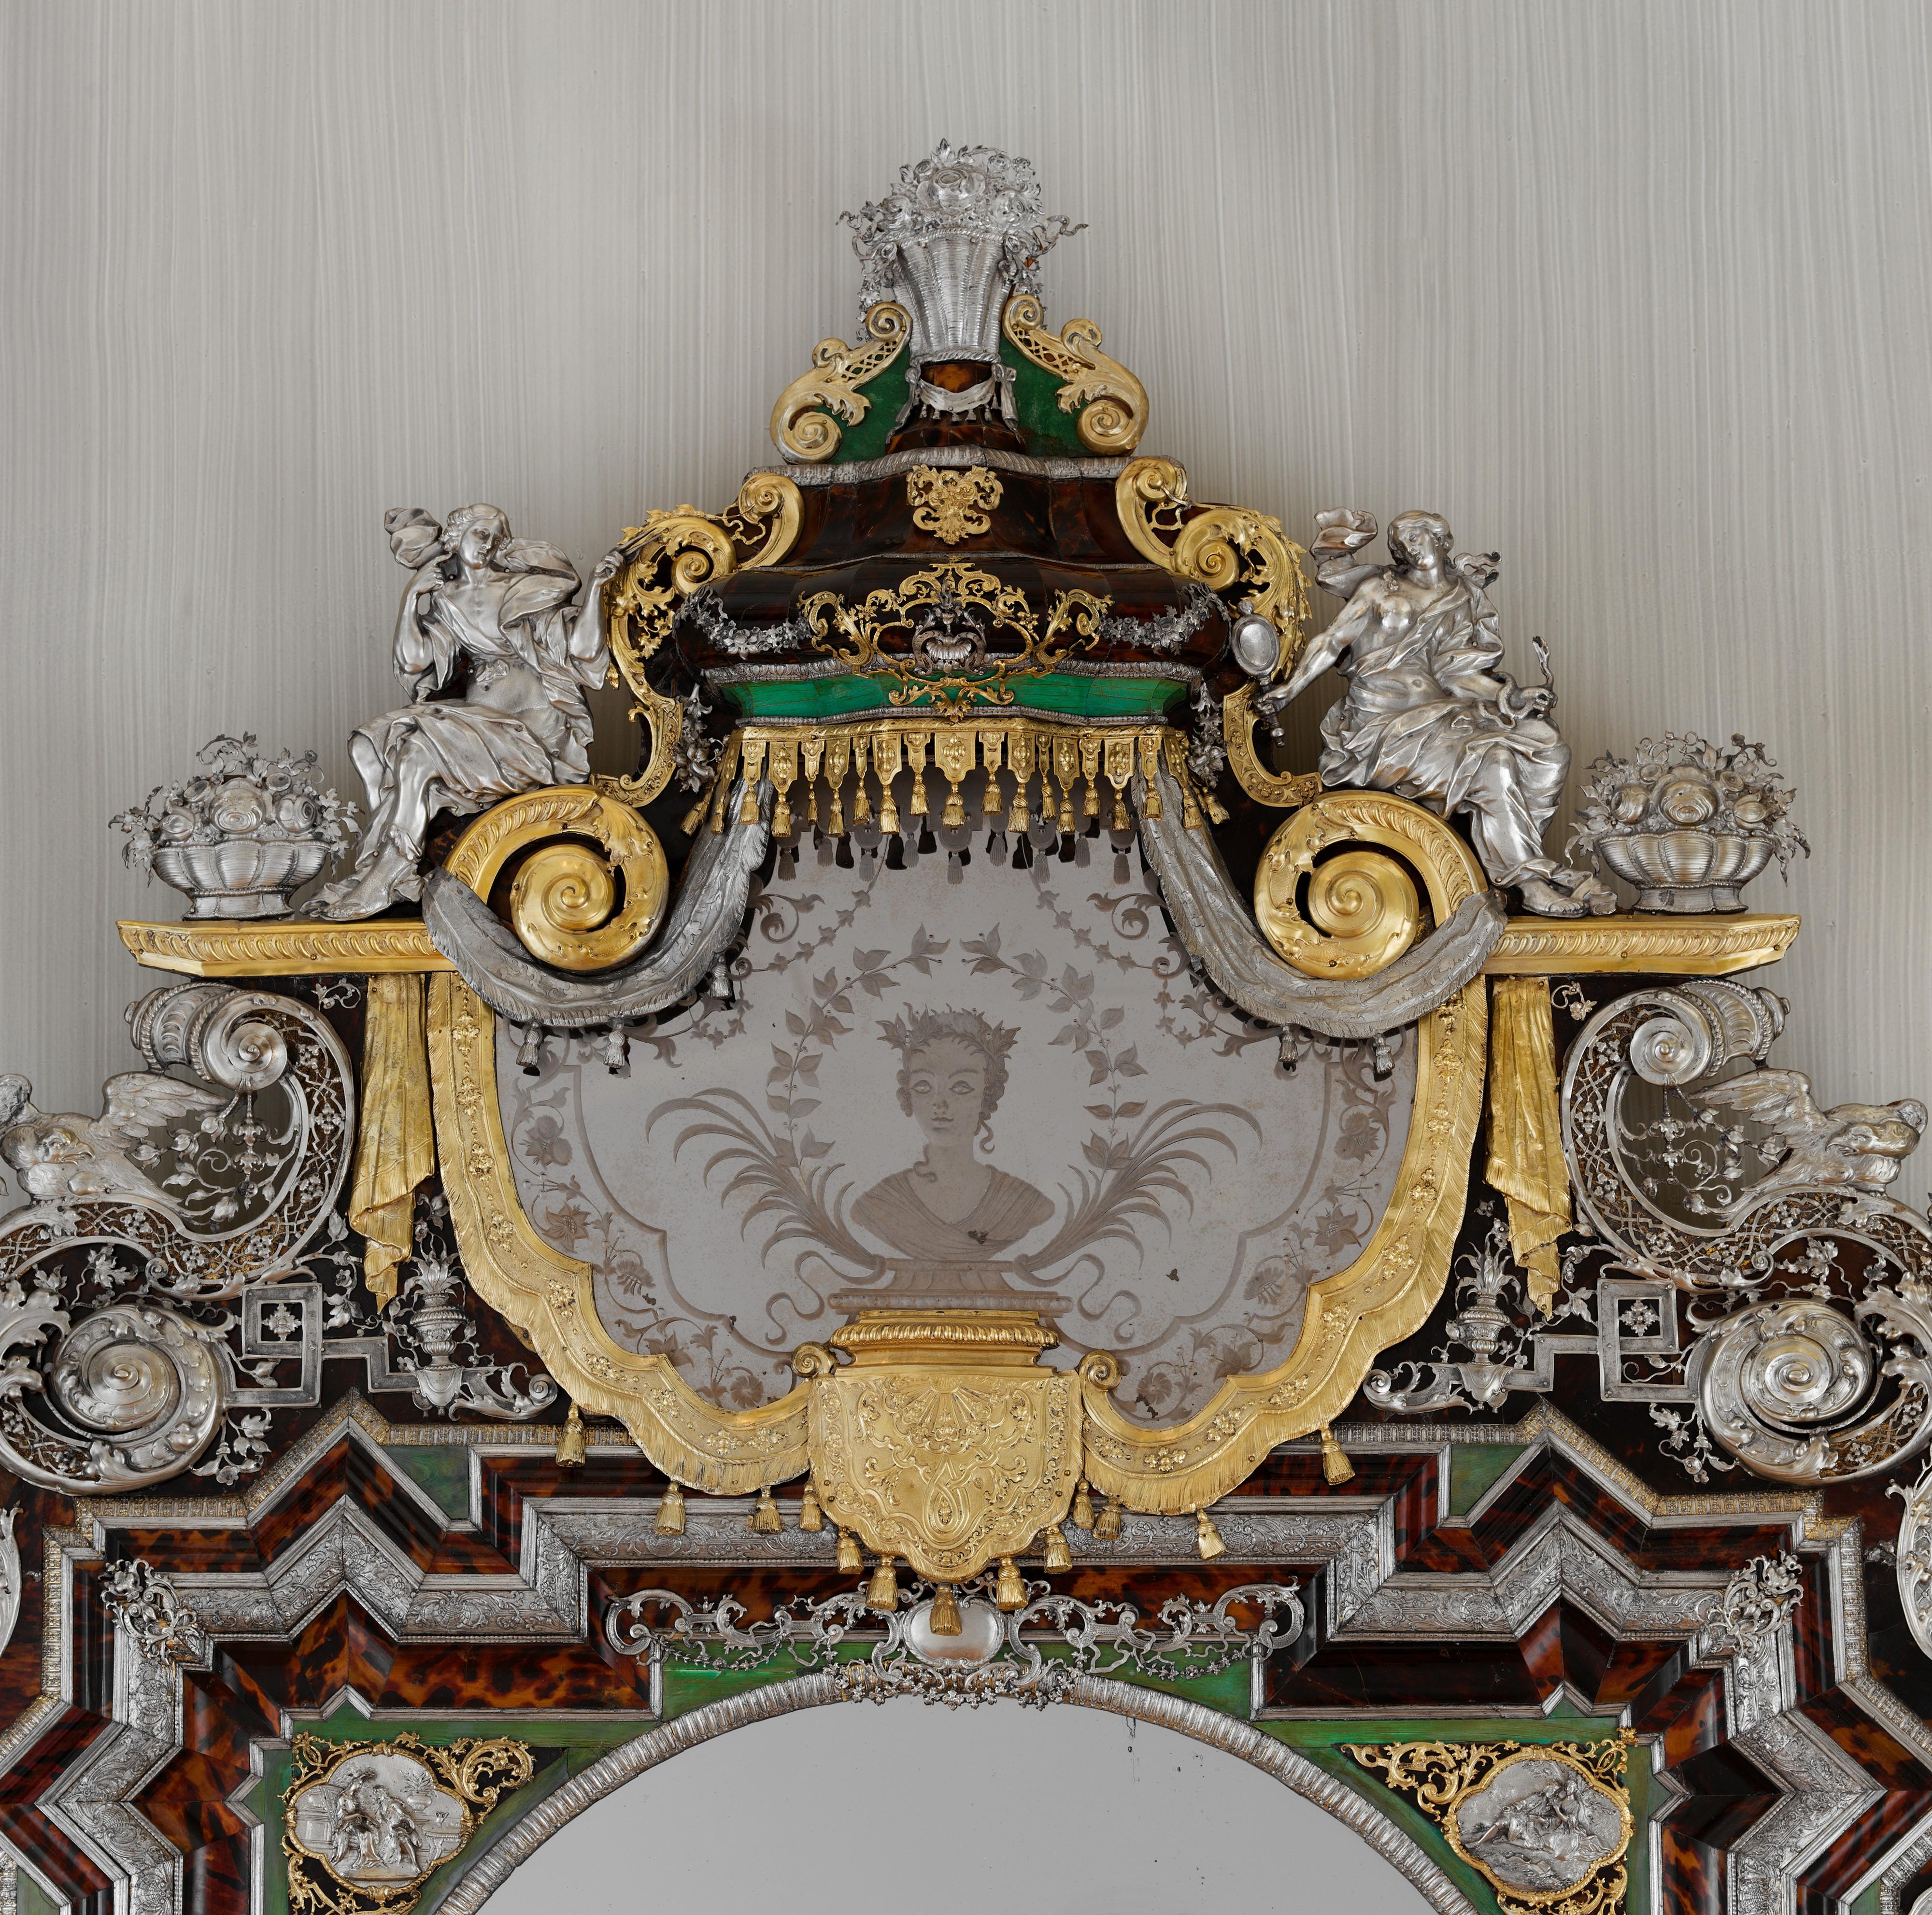 https://images.metmuseum.org/CRDImages/es/original/DP105727.jpg